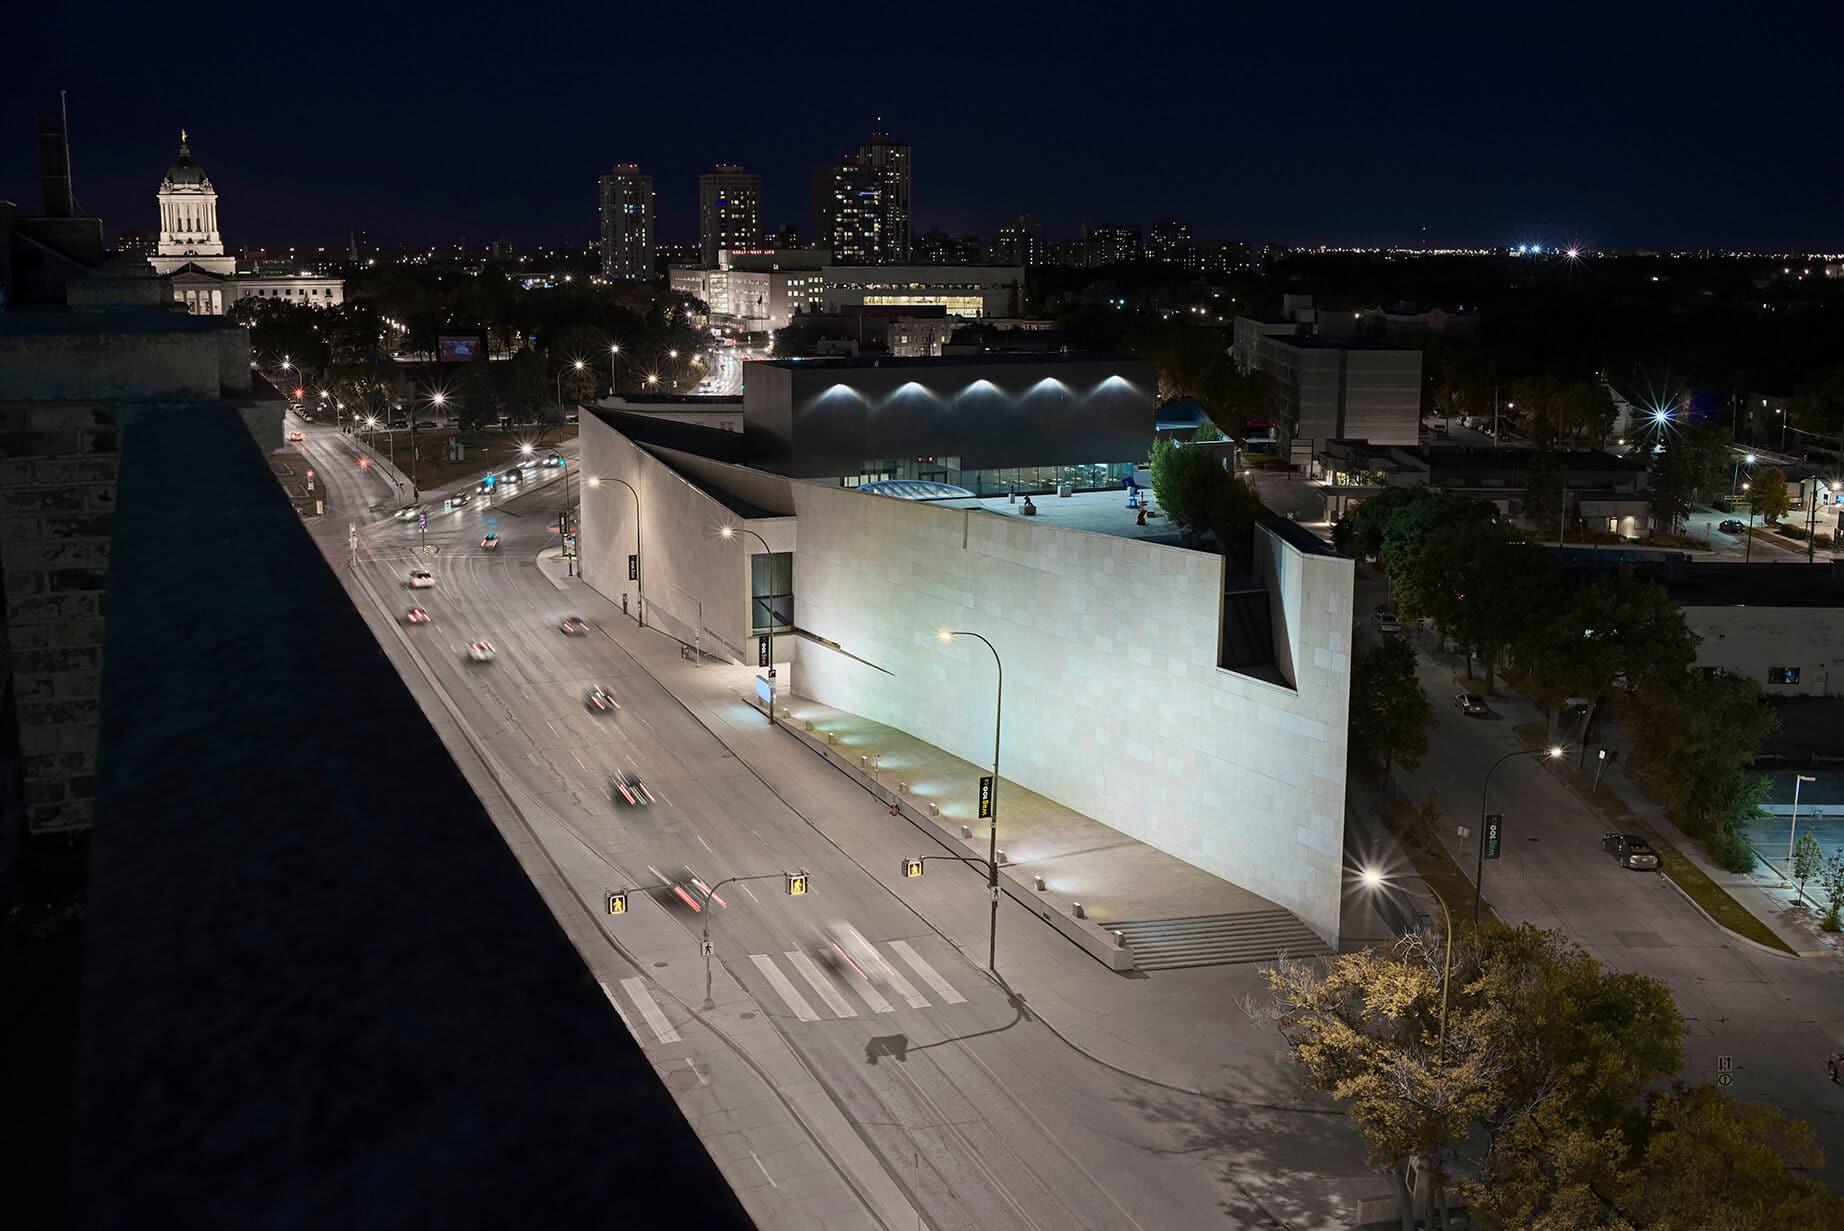 Aerial view of the Winnipeg Art Gallery